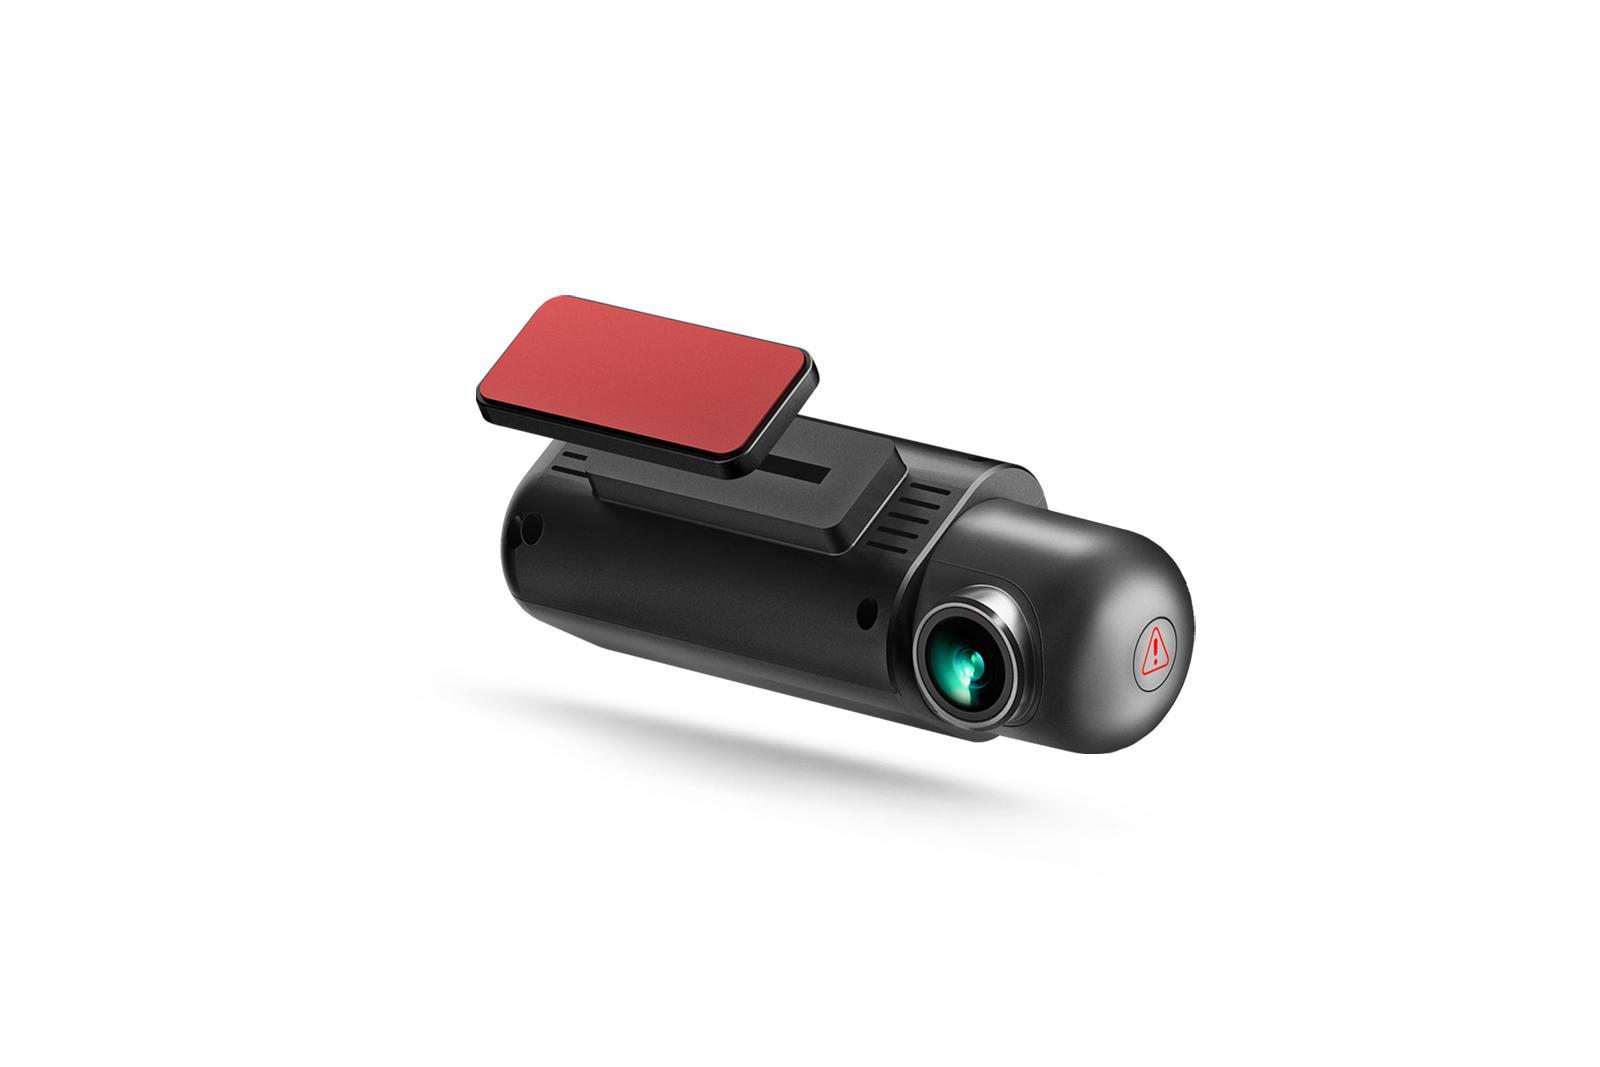 Caméra de bord XBLITZ S4 connaissances d'experts